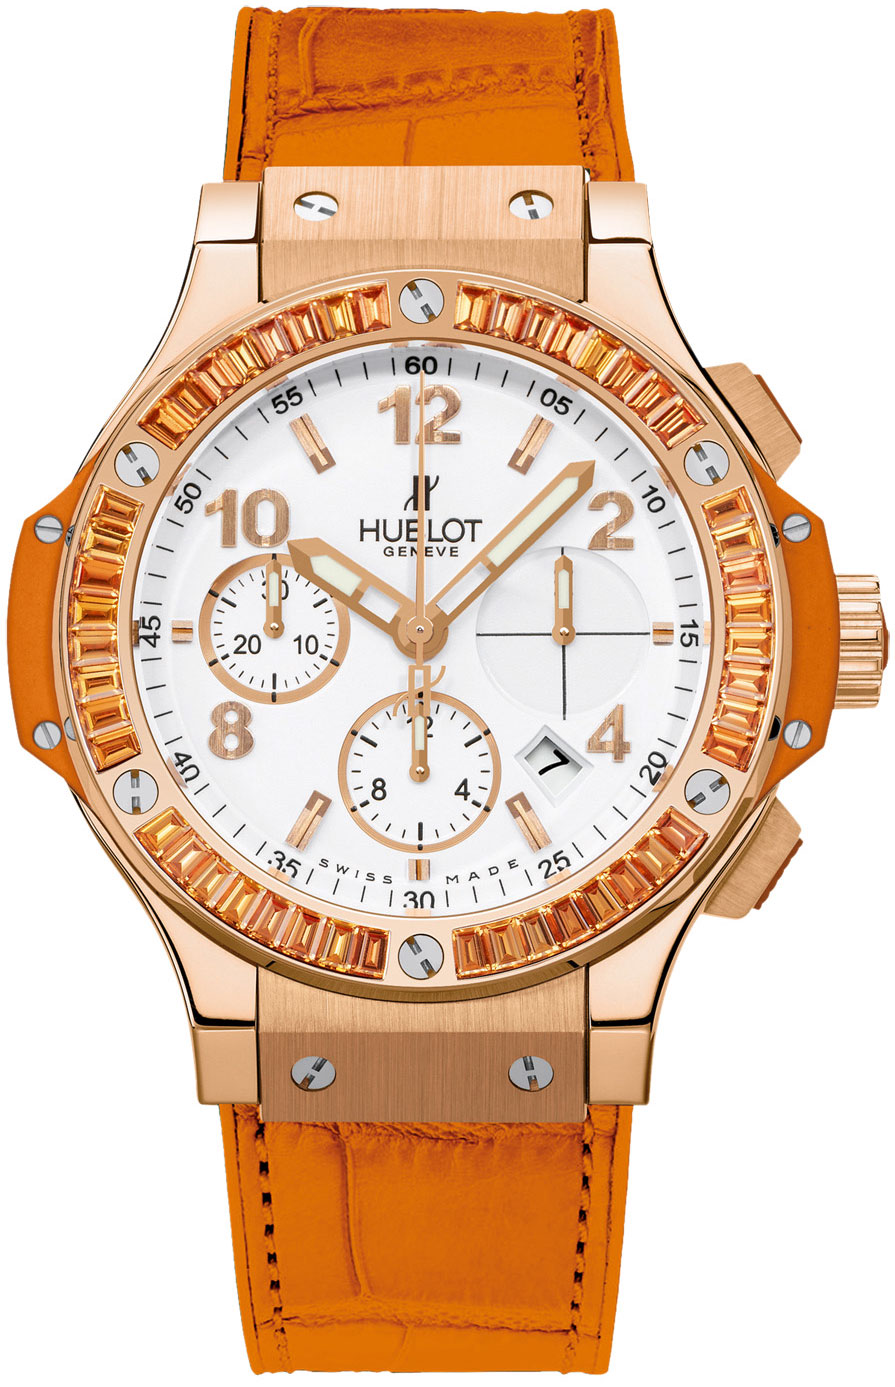 Image of Hublot Big Bang Tutti Frutti 41mm Ladies Watch Model 341.PO.2010.LR.1906